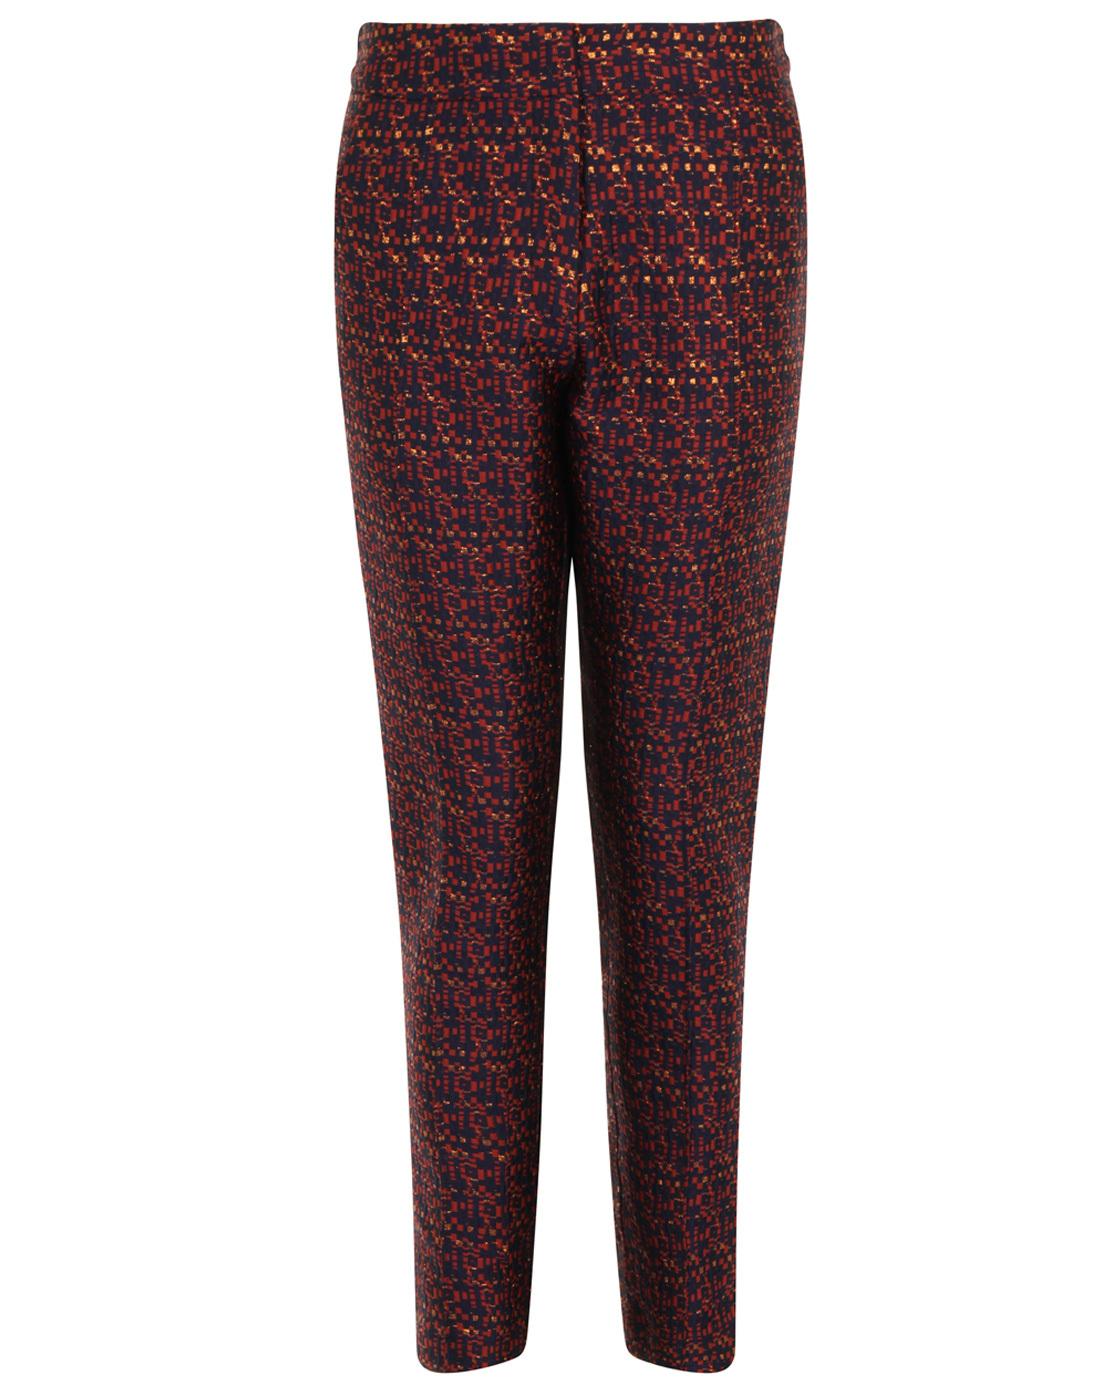 Lorraine DARLING Retro Metallic Textured Trousers